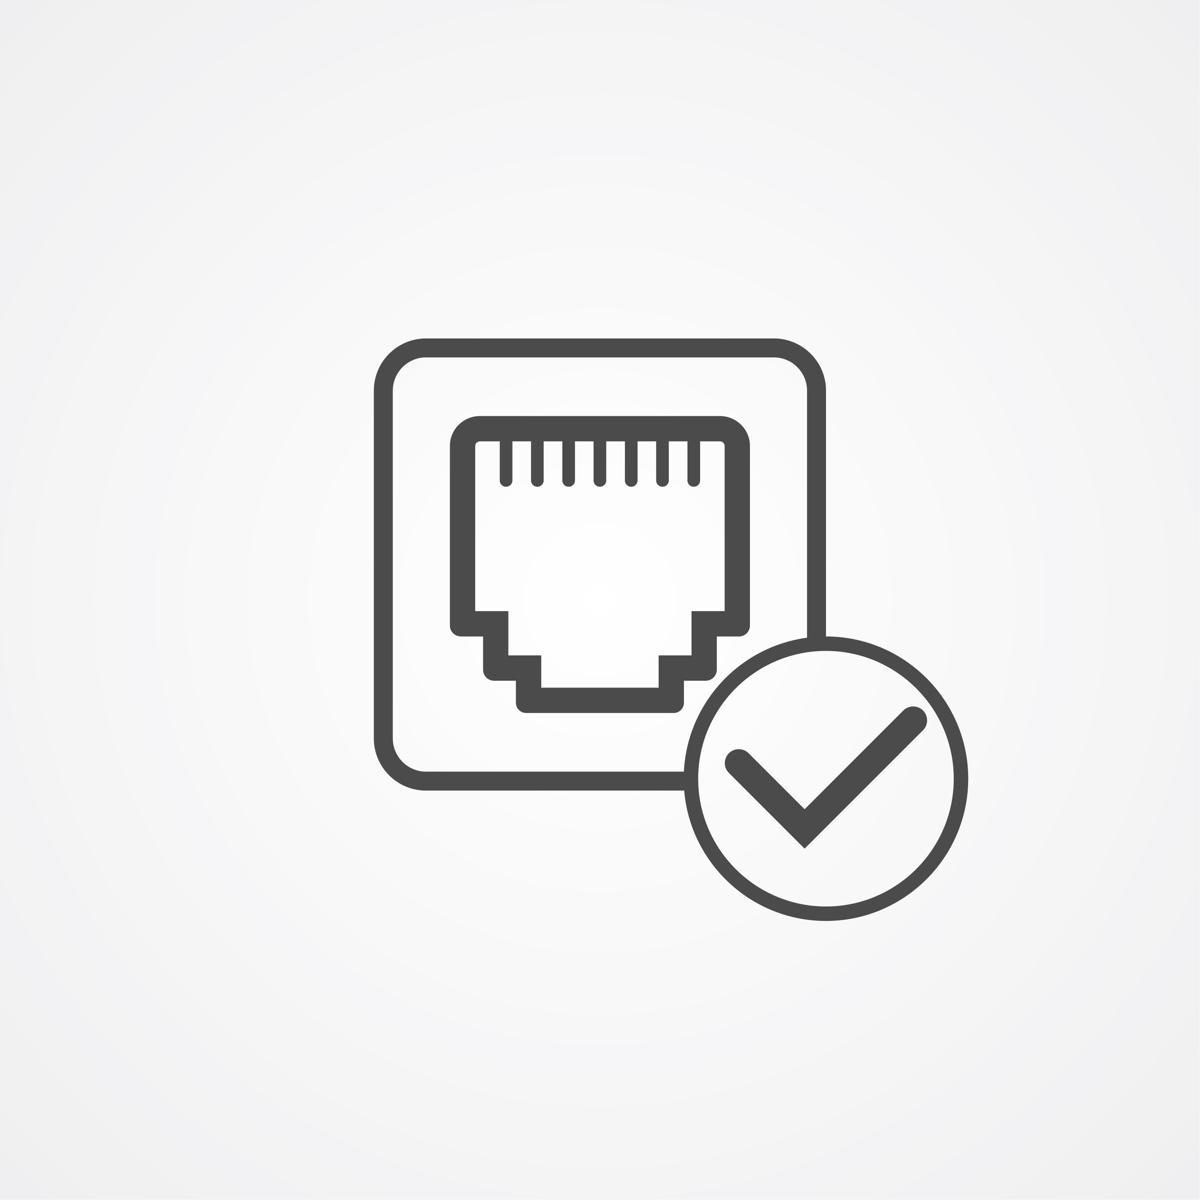 BT Ethernet Services